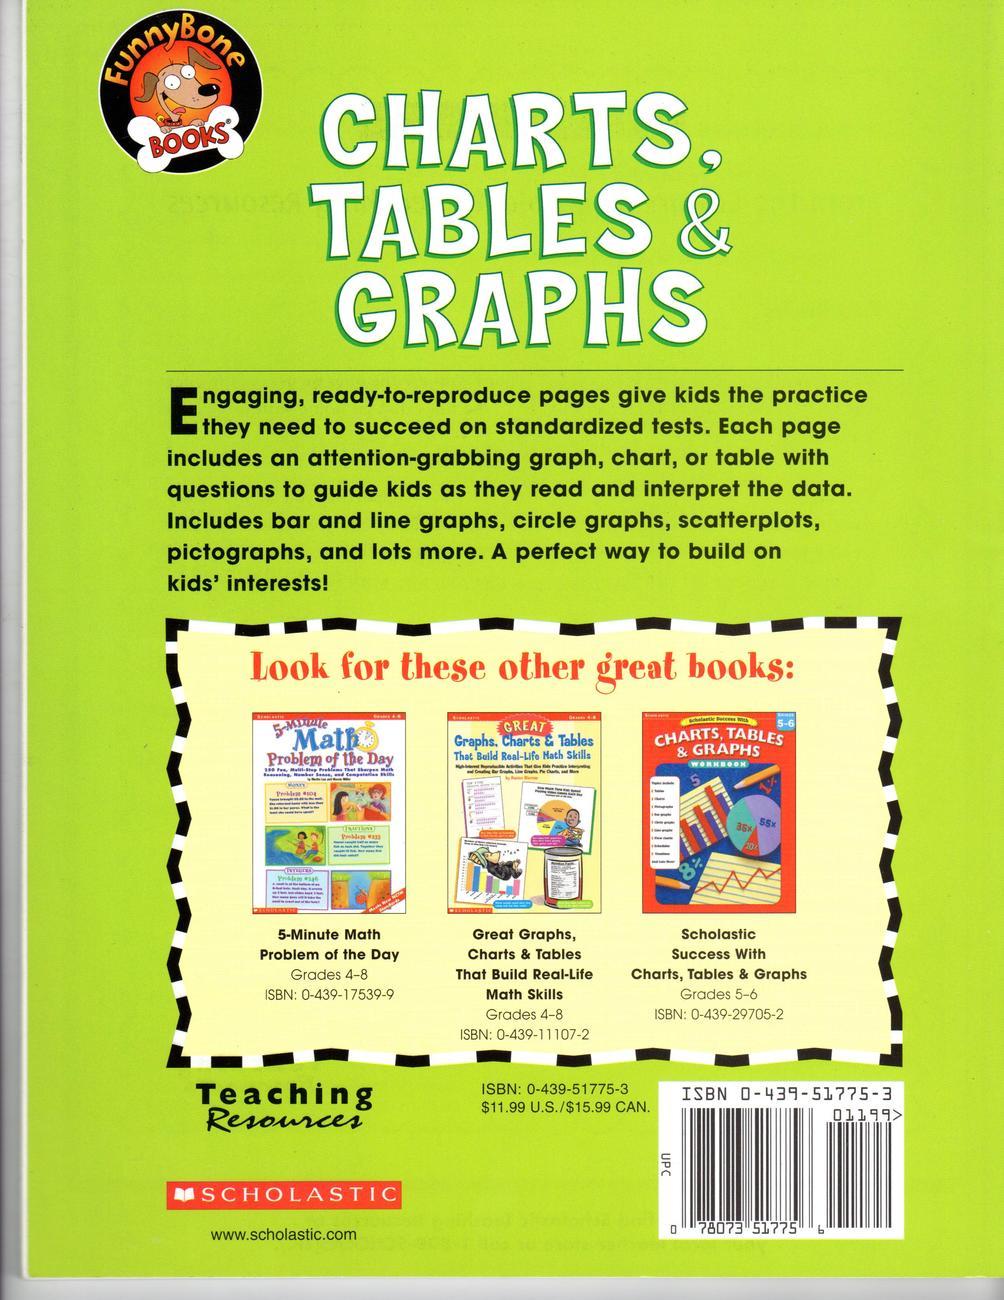 Charts, Tables & Graphs, Grades 4-6